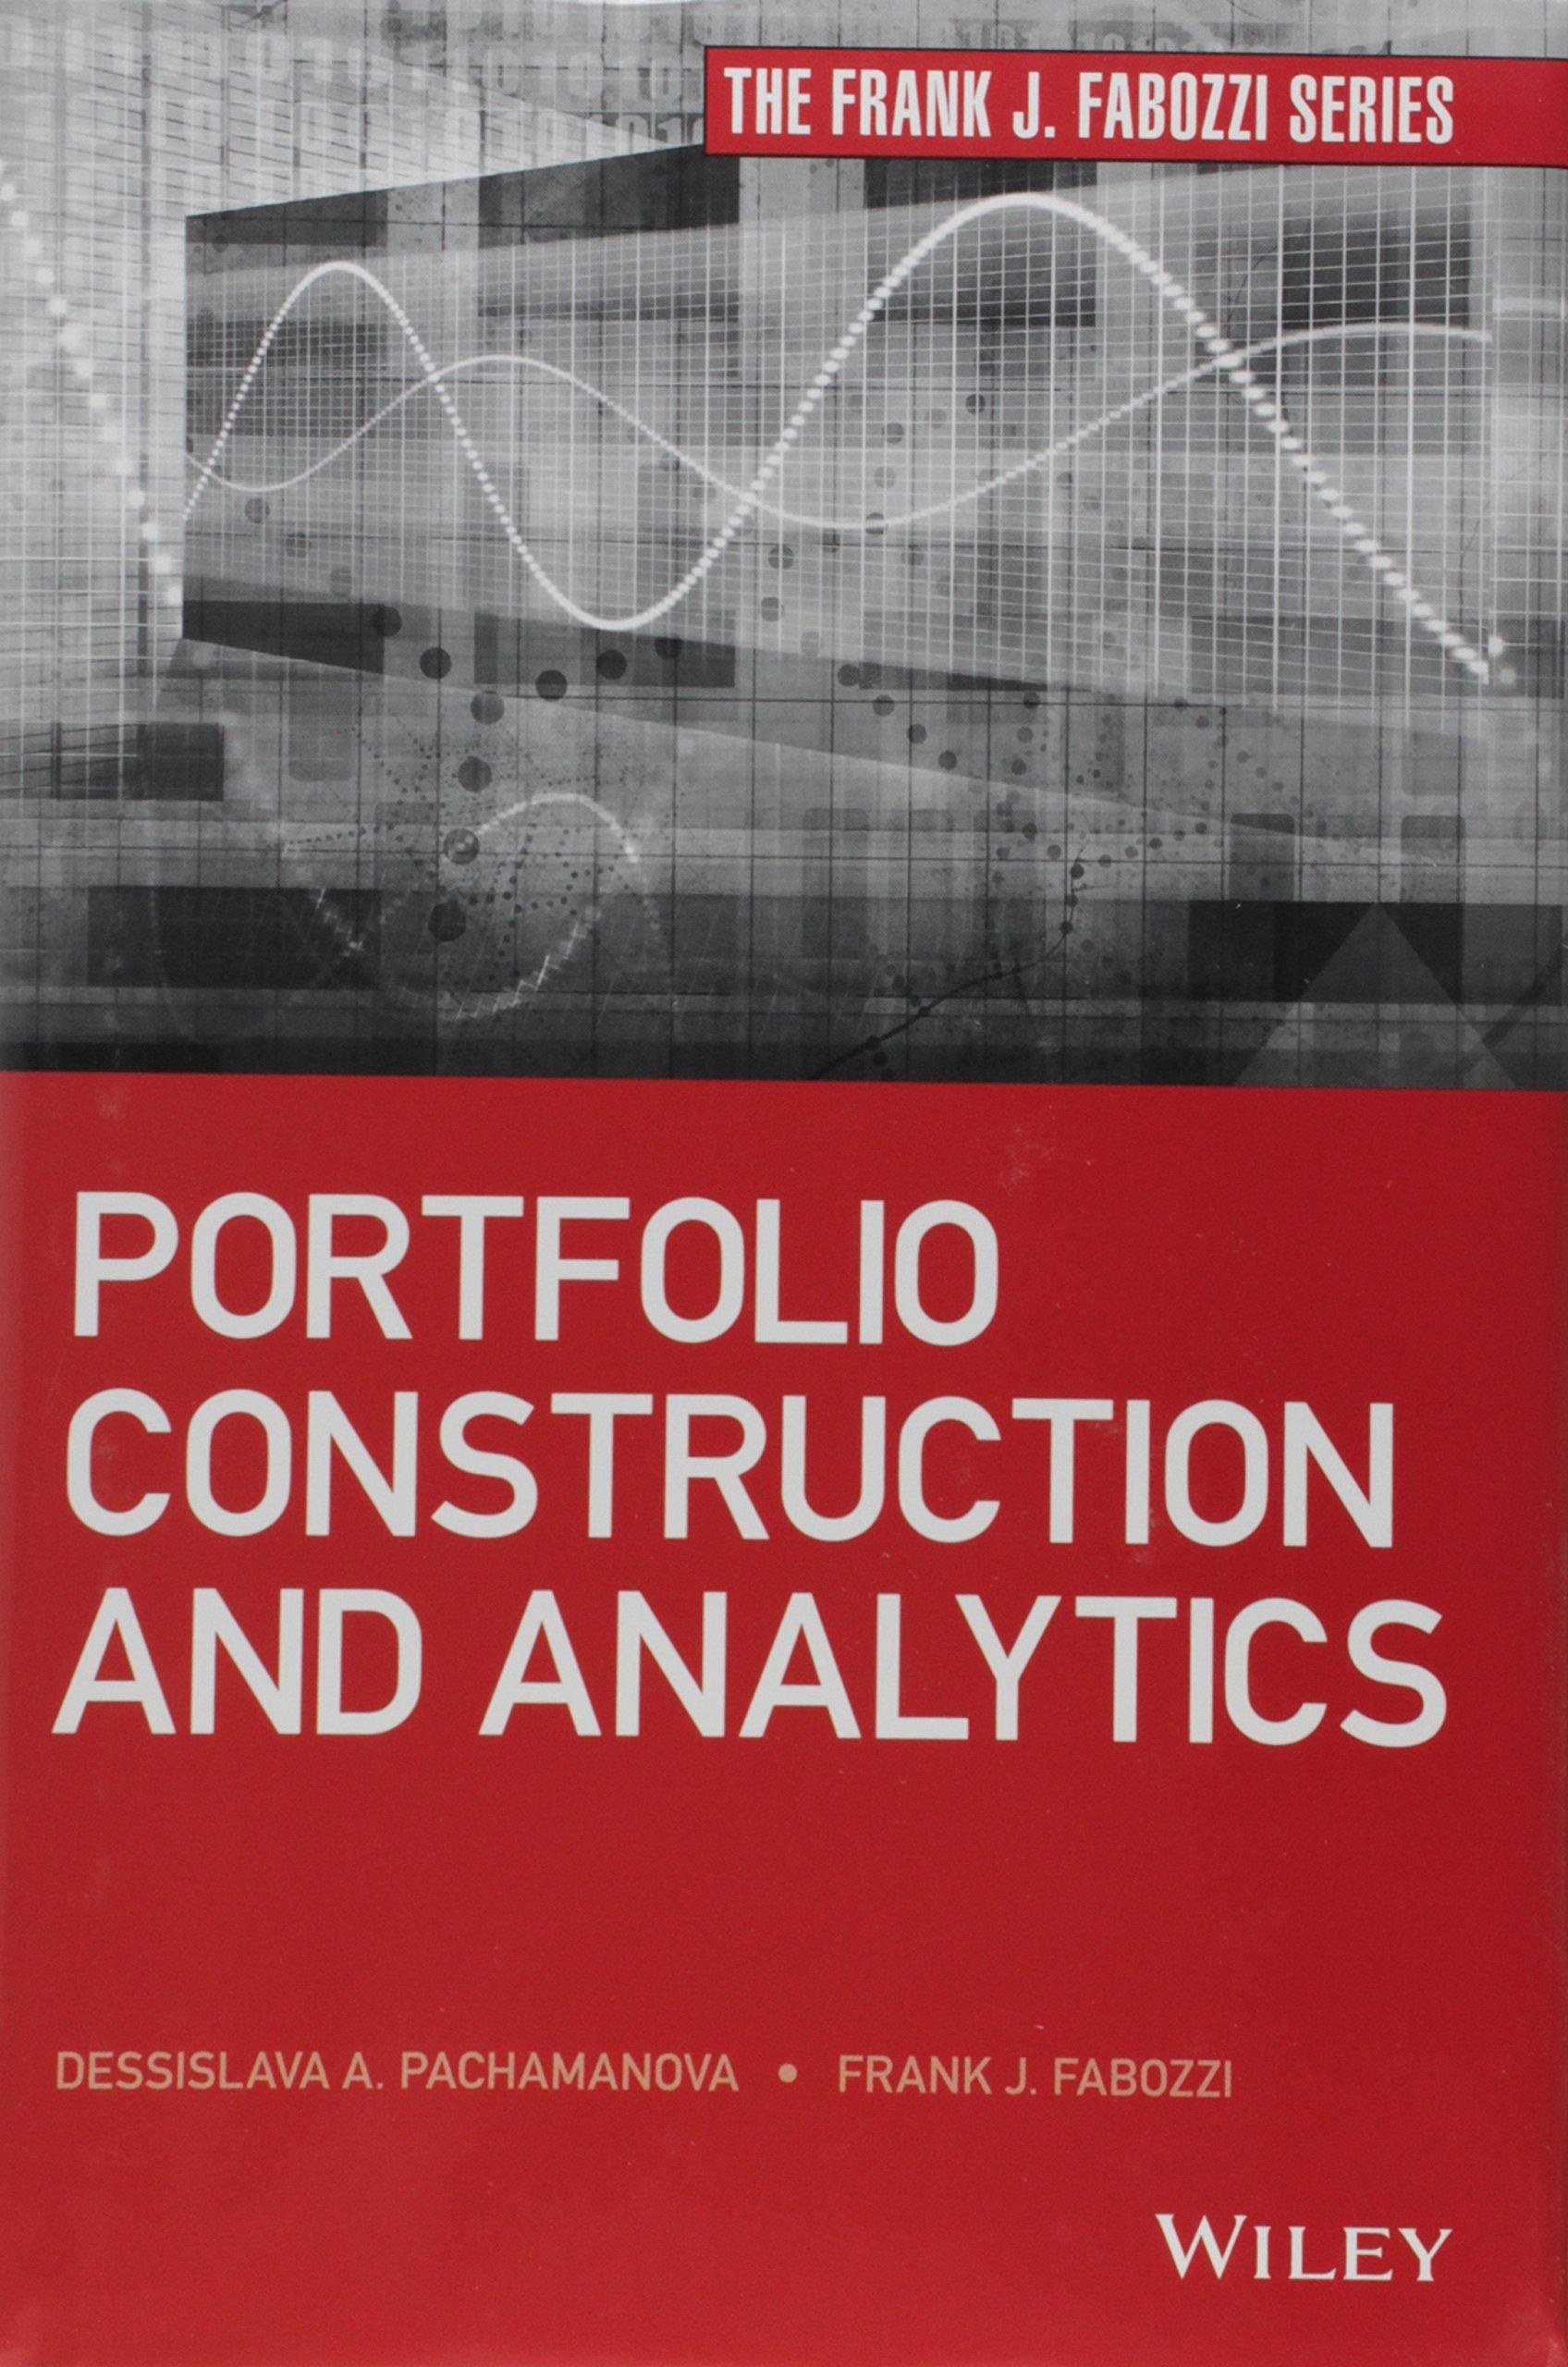 Portfolio Construction and Analytics (Frank J. Fabozzi Series)